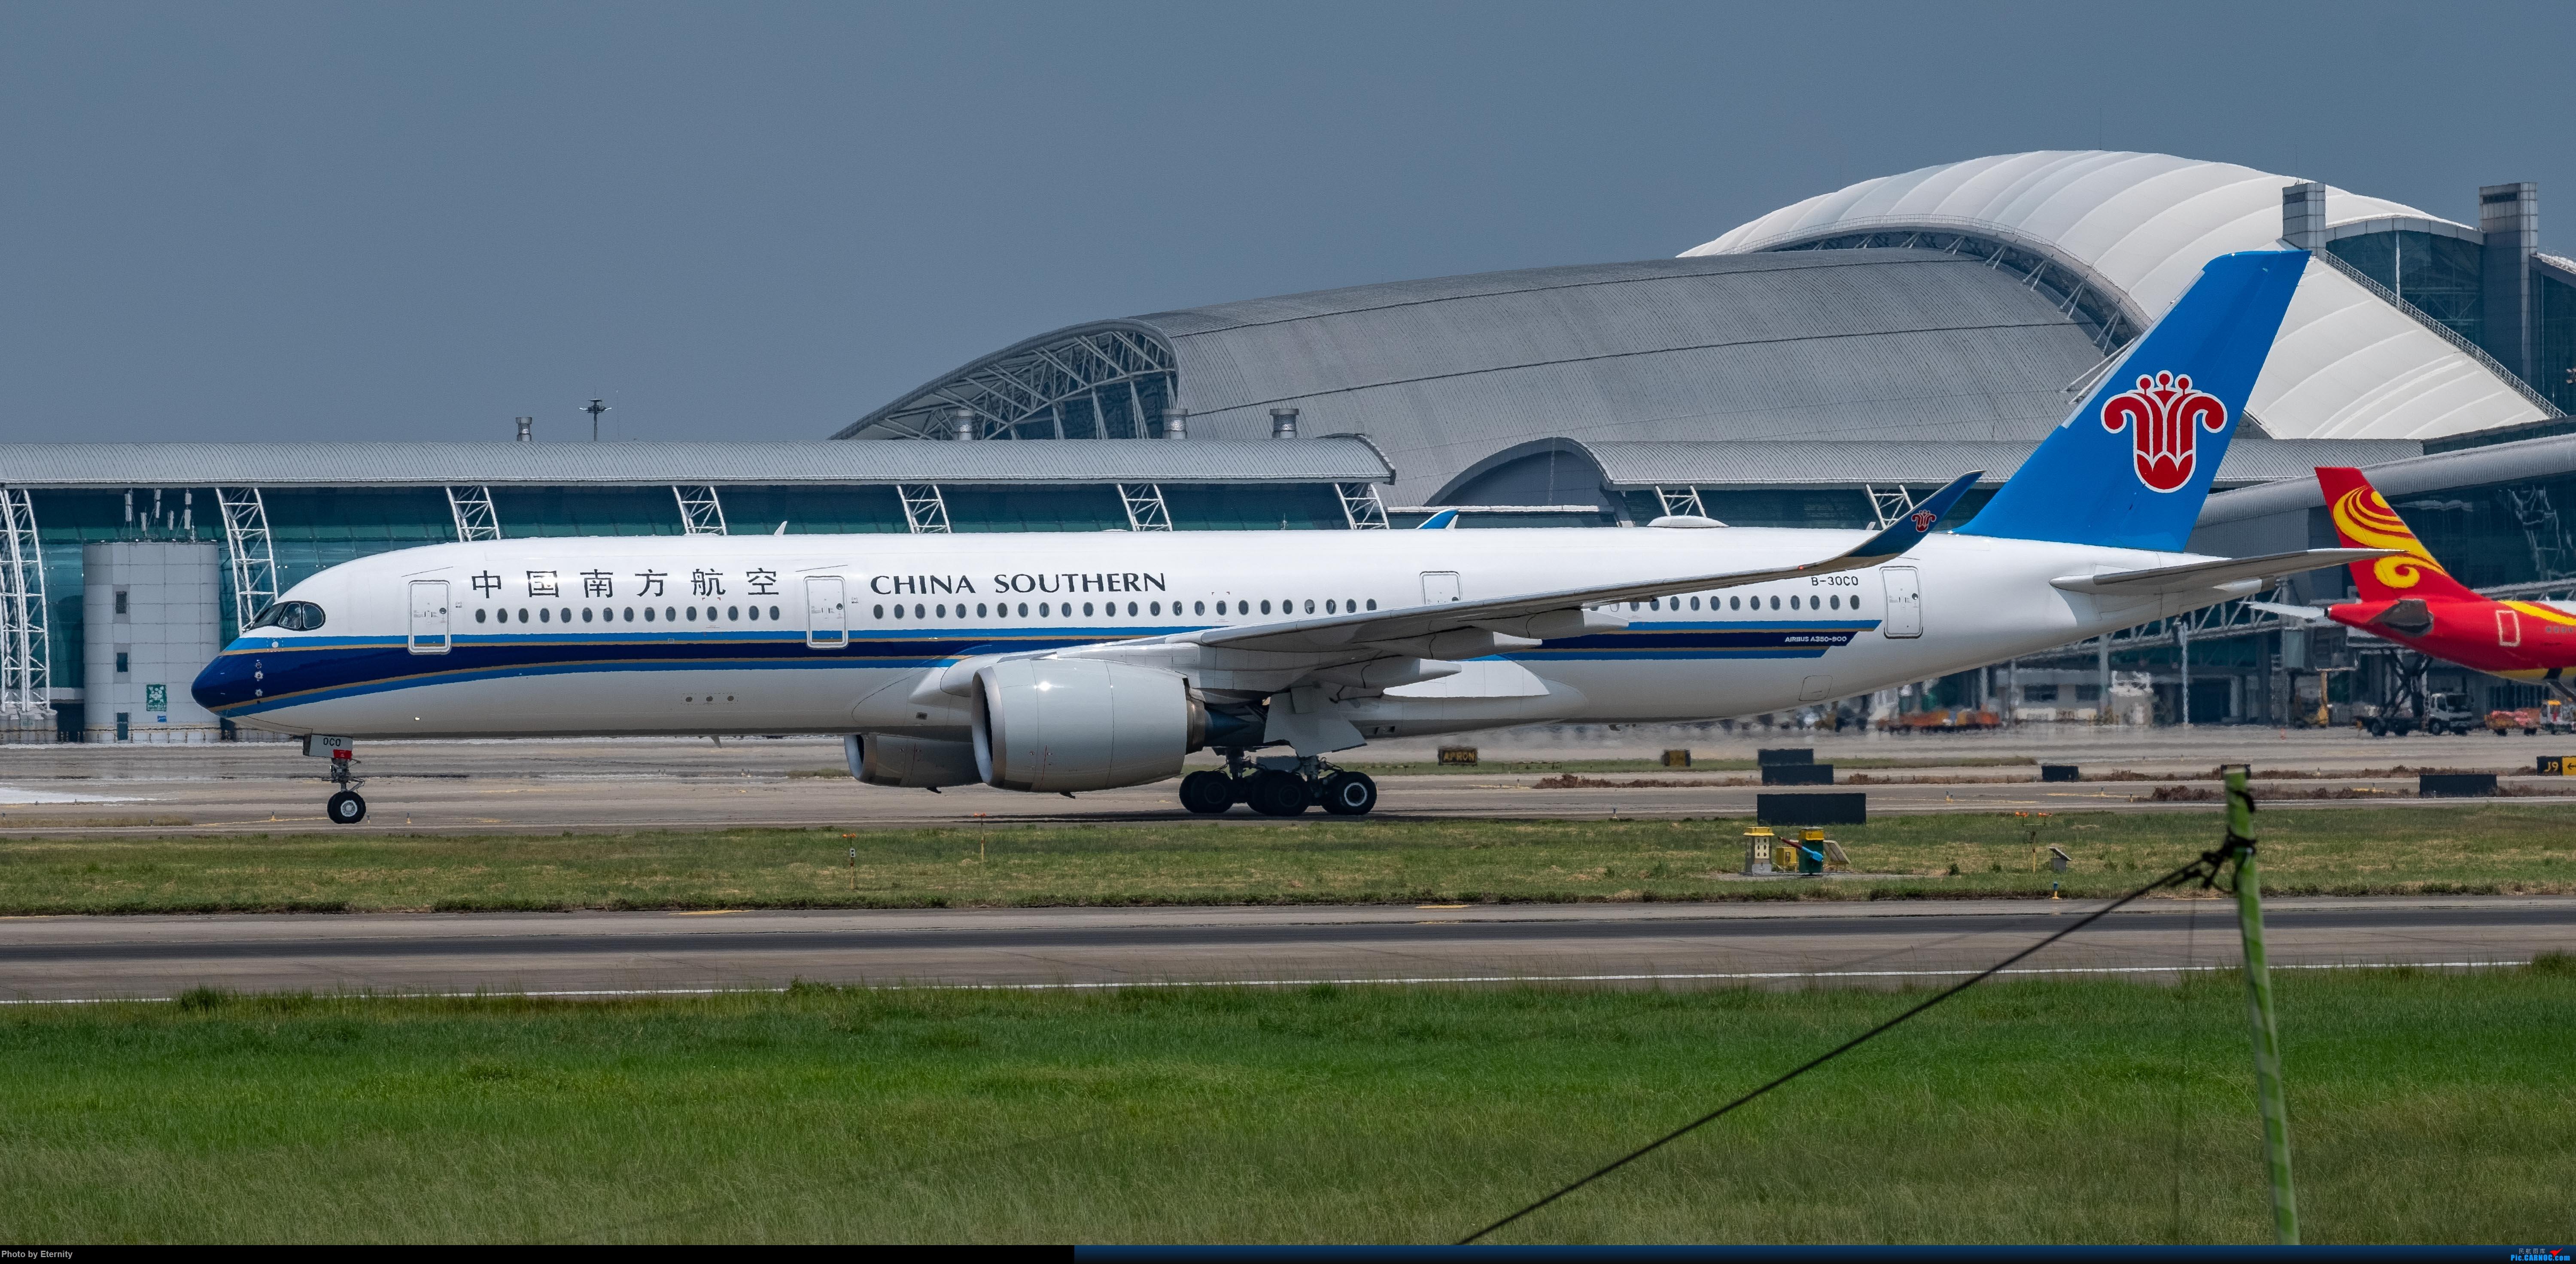 Re:[原创]后疫情期间的暑假国内游 | 西安-上海-广州-成都 | 体验国内3条干线 | 吉祥航空787 | 南航350 | 海航737 AURBUS A350-900 B-30C0 中国广州白云国际机场